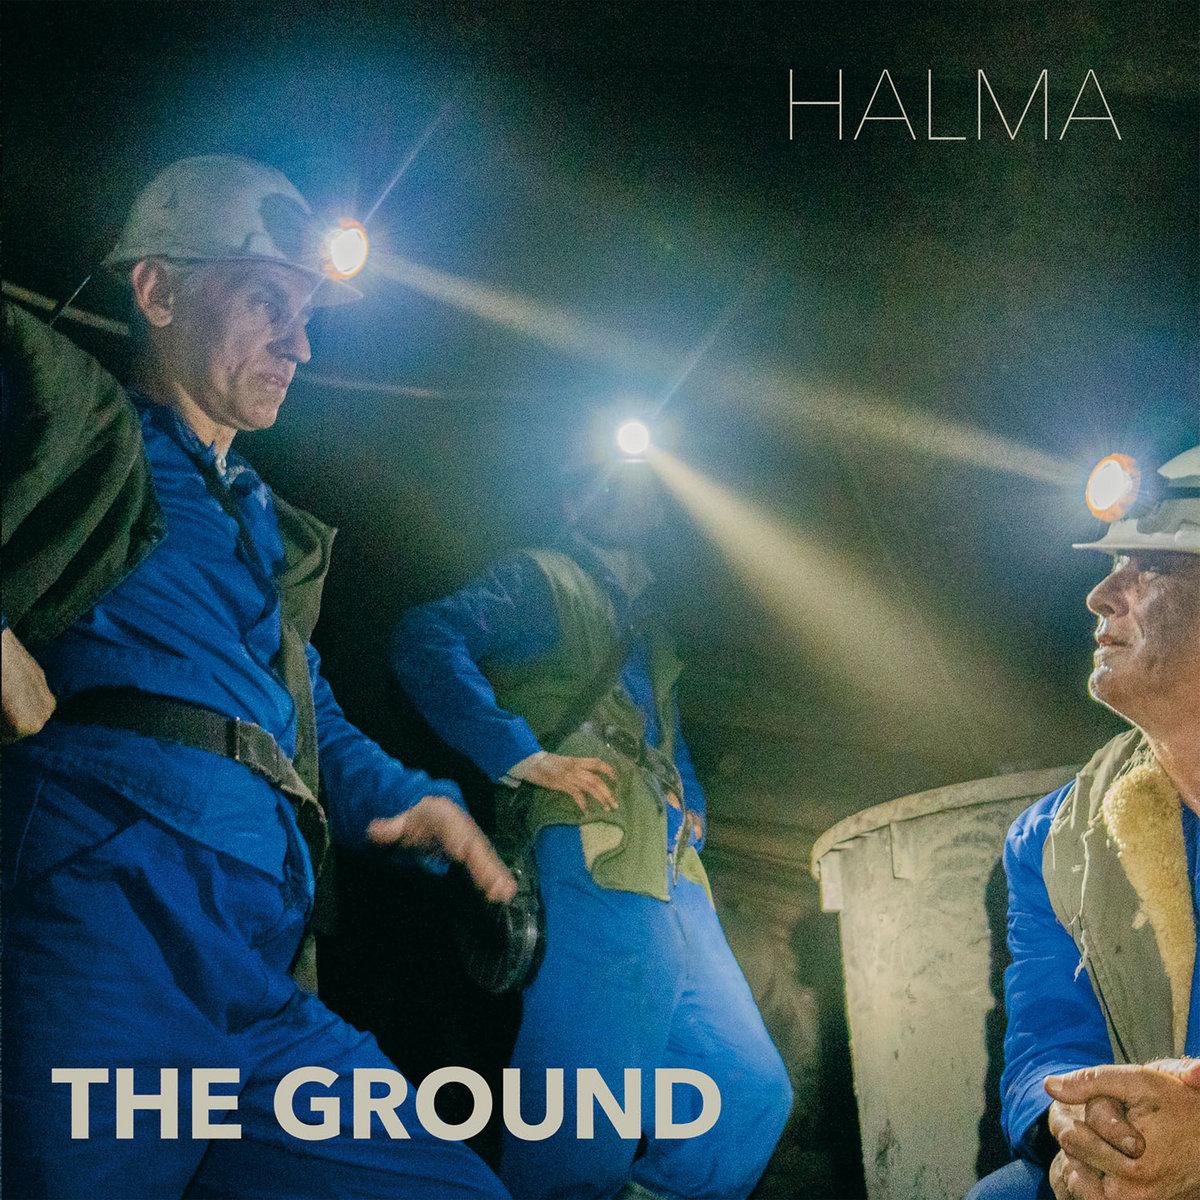 HALMA - The Ground